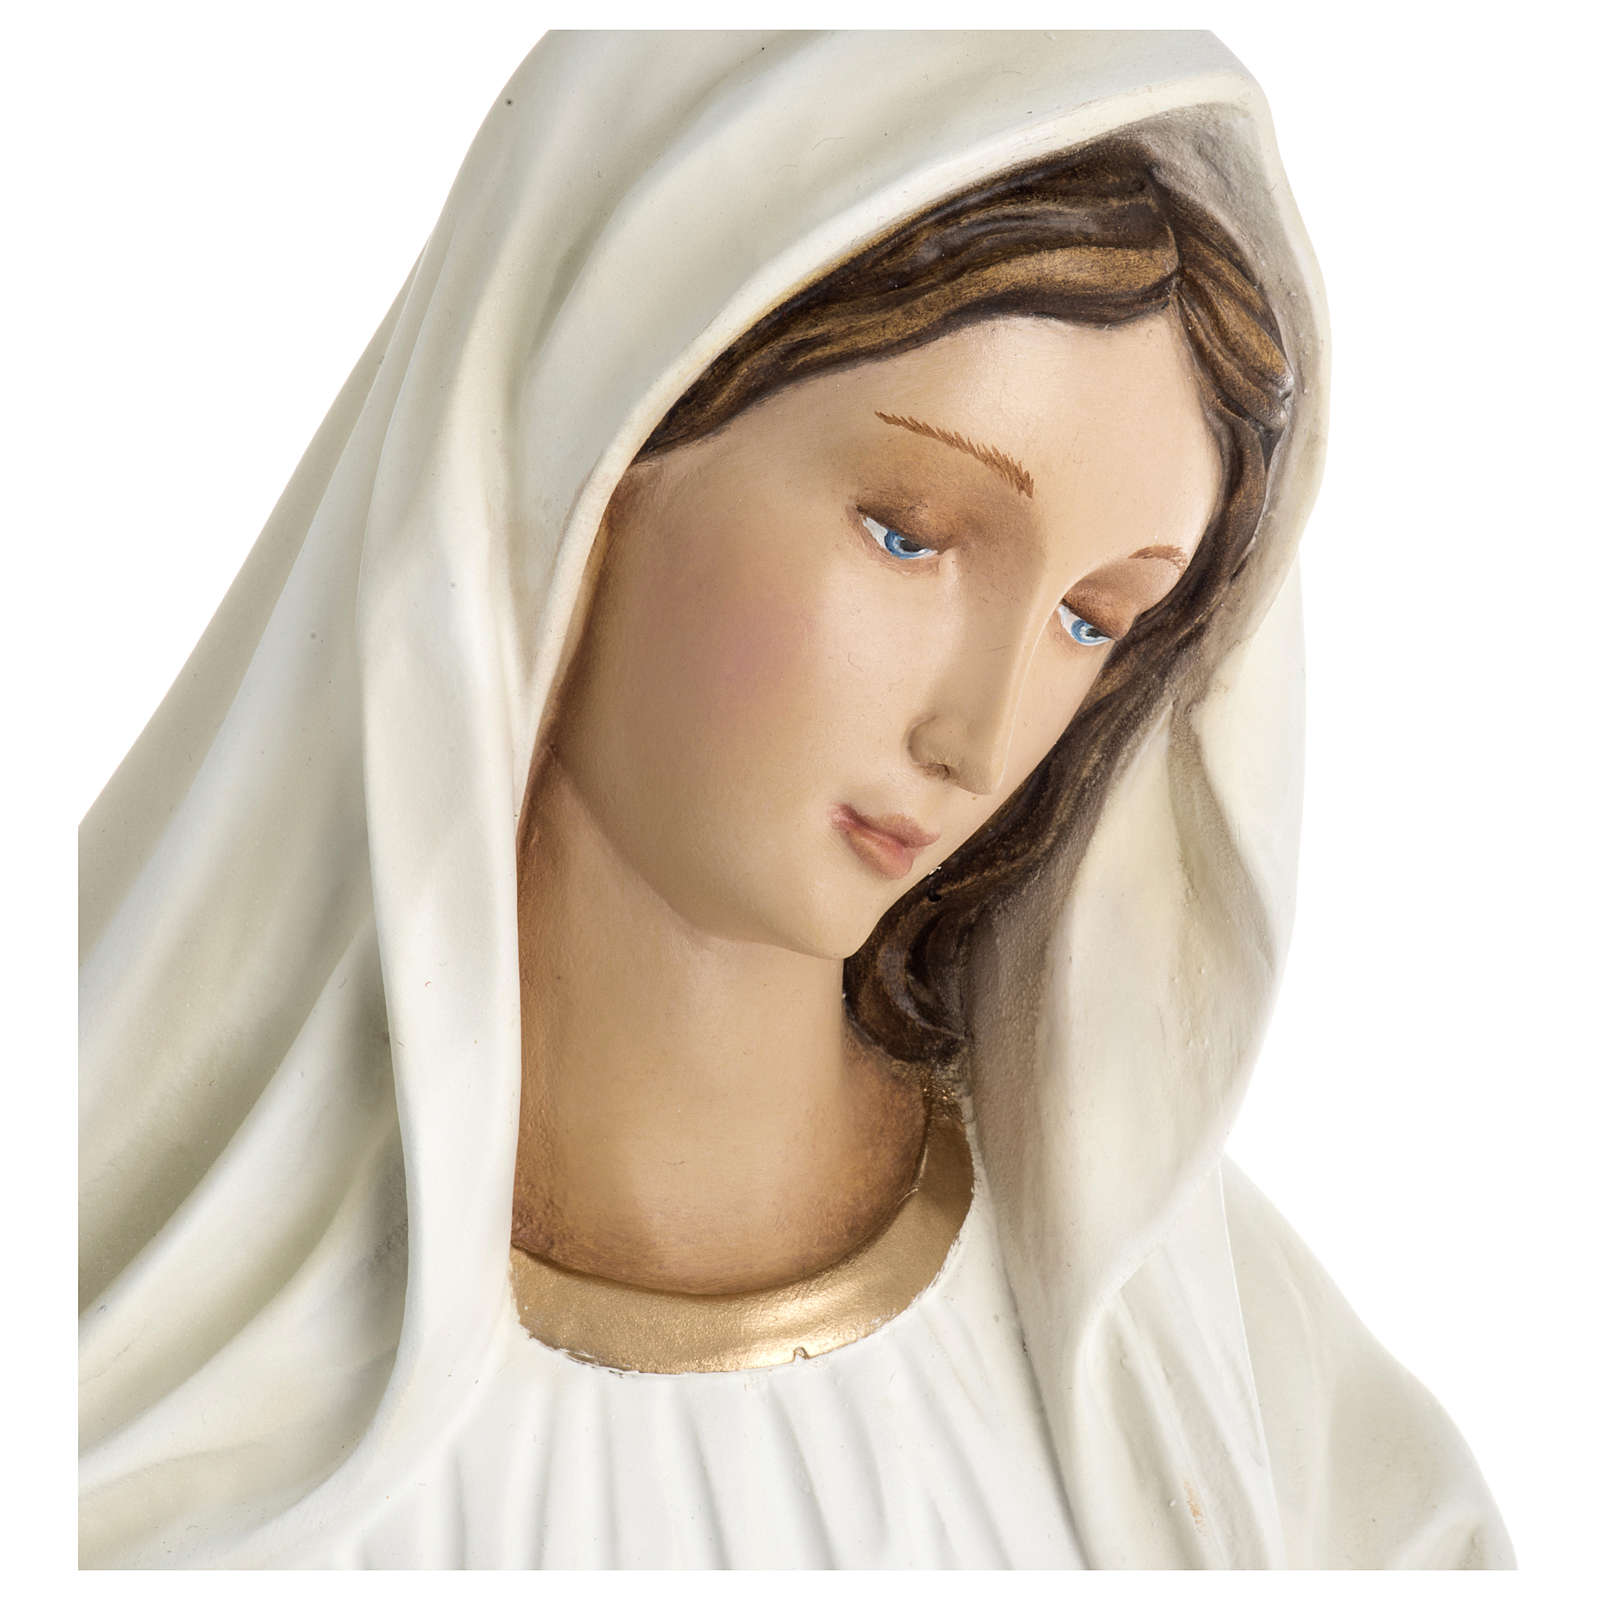 Statua Madonna Medjugorje vetroresina 60 cm PER ESTERNO fin. speciale 4